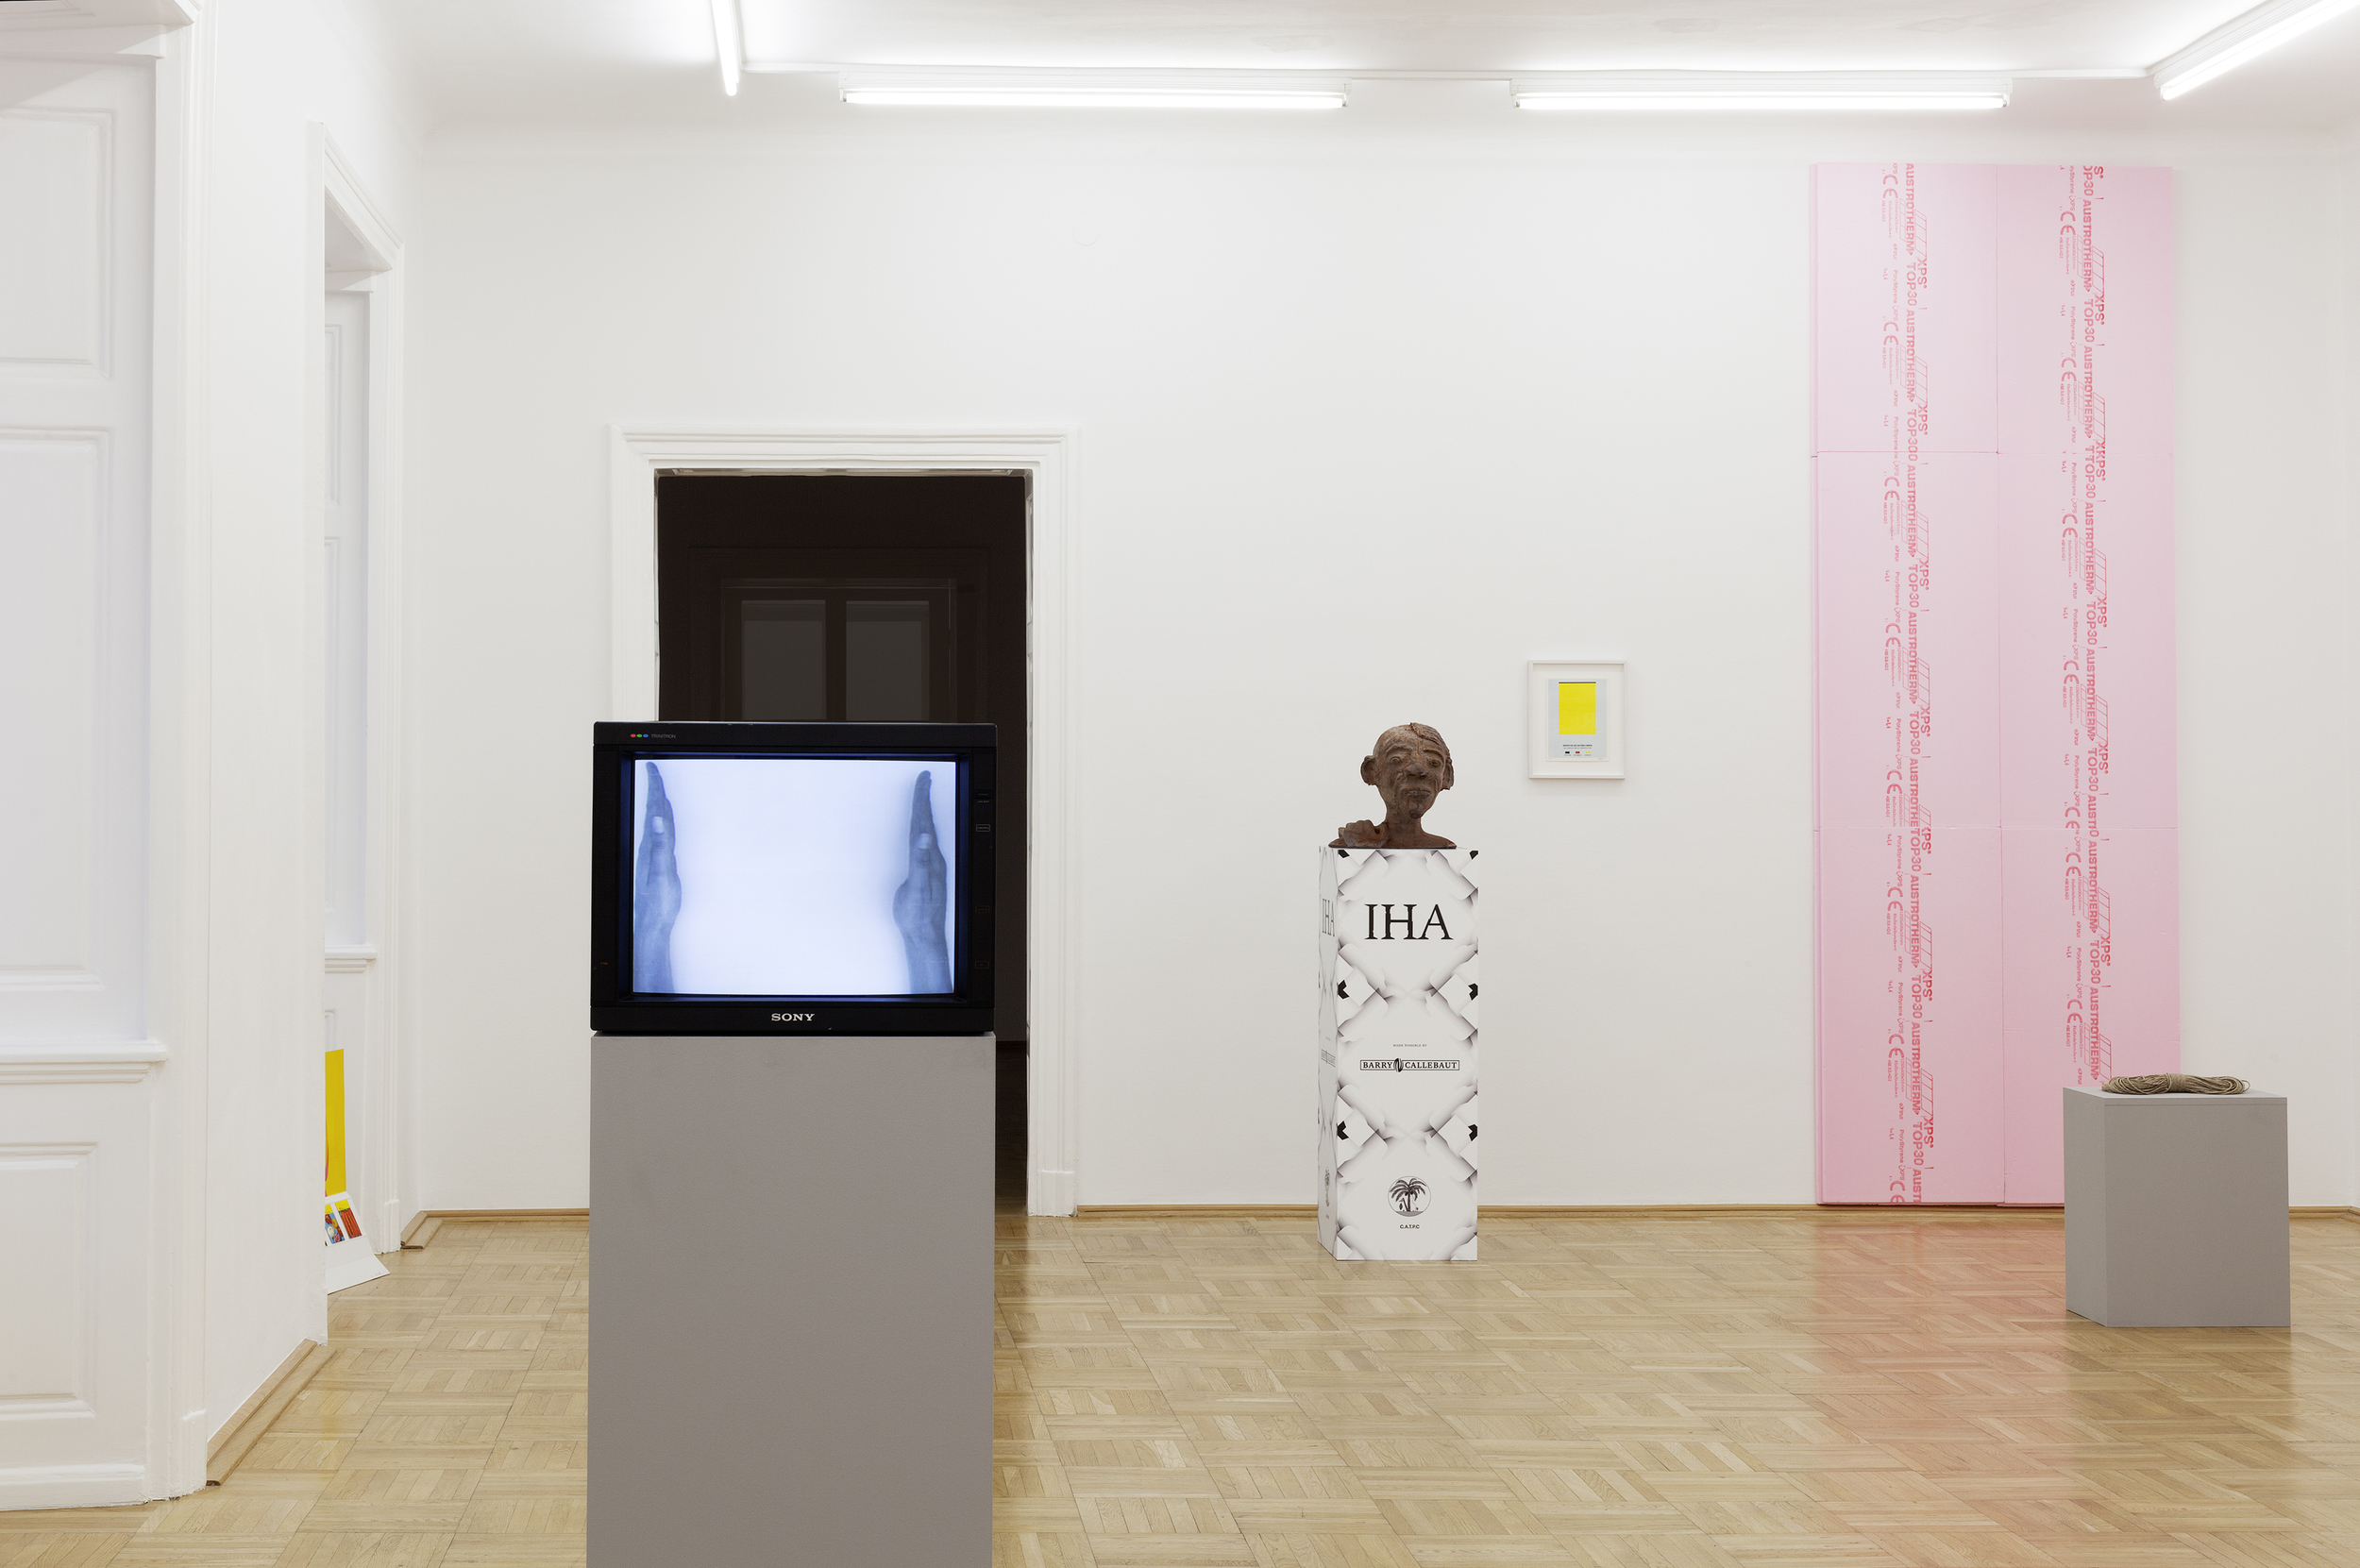 Galerie Nächst St. Stephan Rosemarie Schwarzwälder, Ausstellungsansicht   Produktion,  2015  .  Foto: Markus Wörgötter.